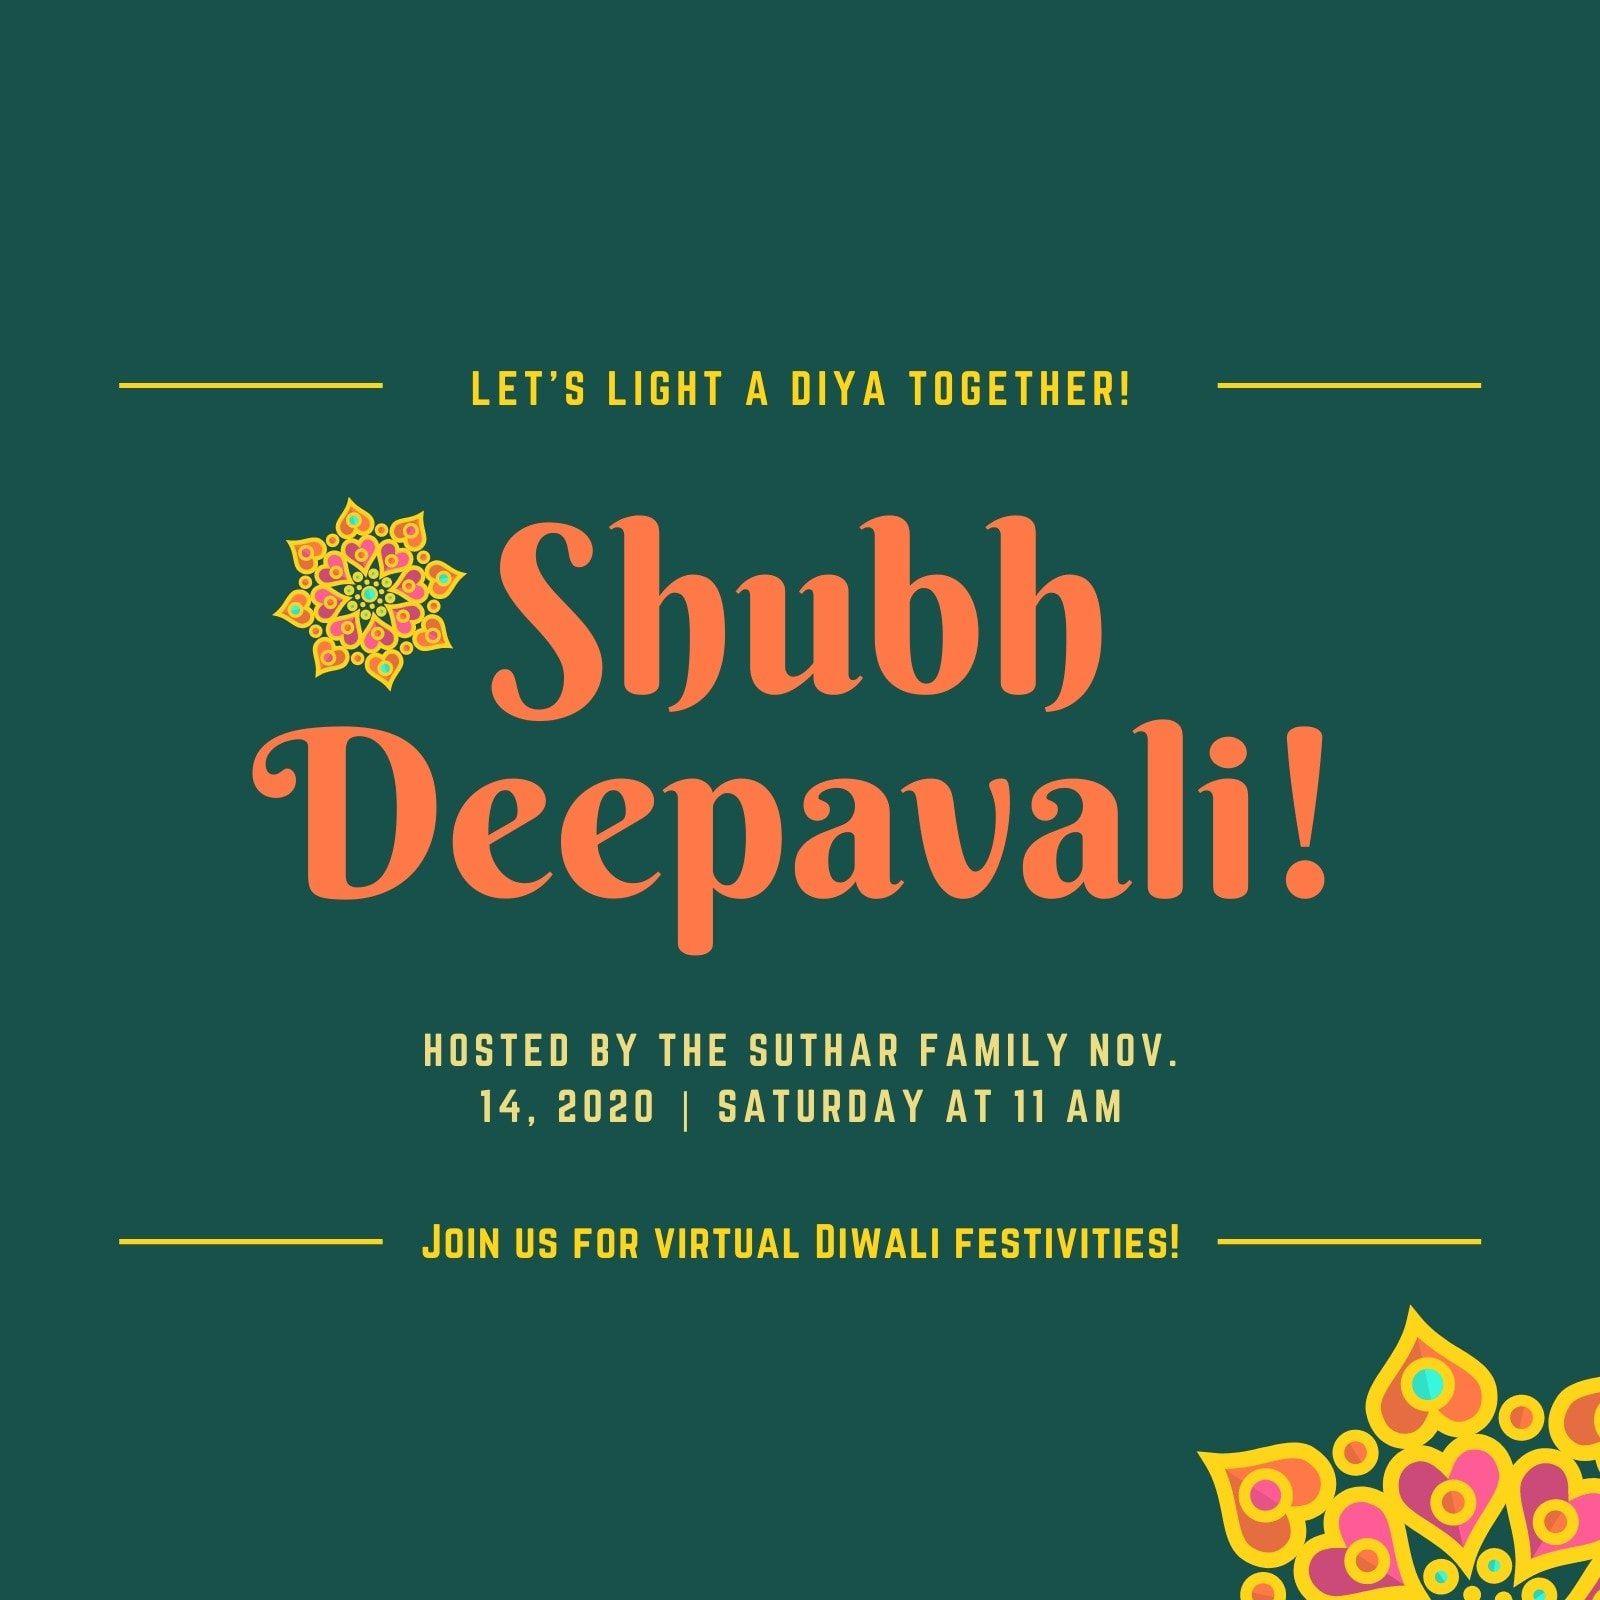 001 Wondrou Diwali Party Invite Template Free High Def Full